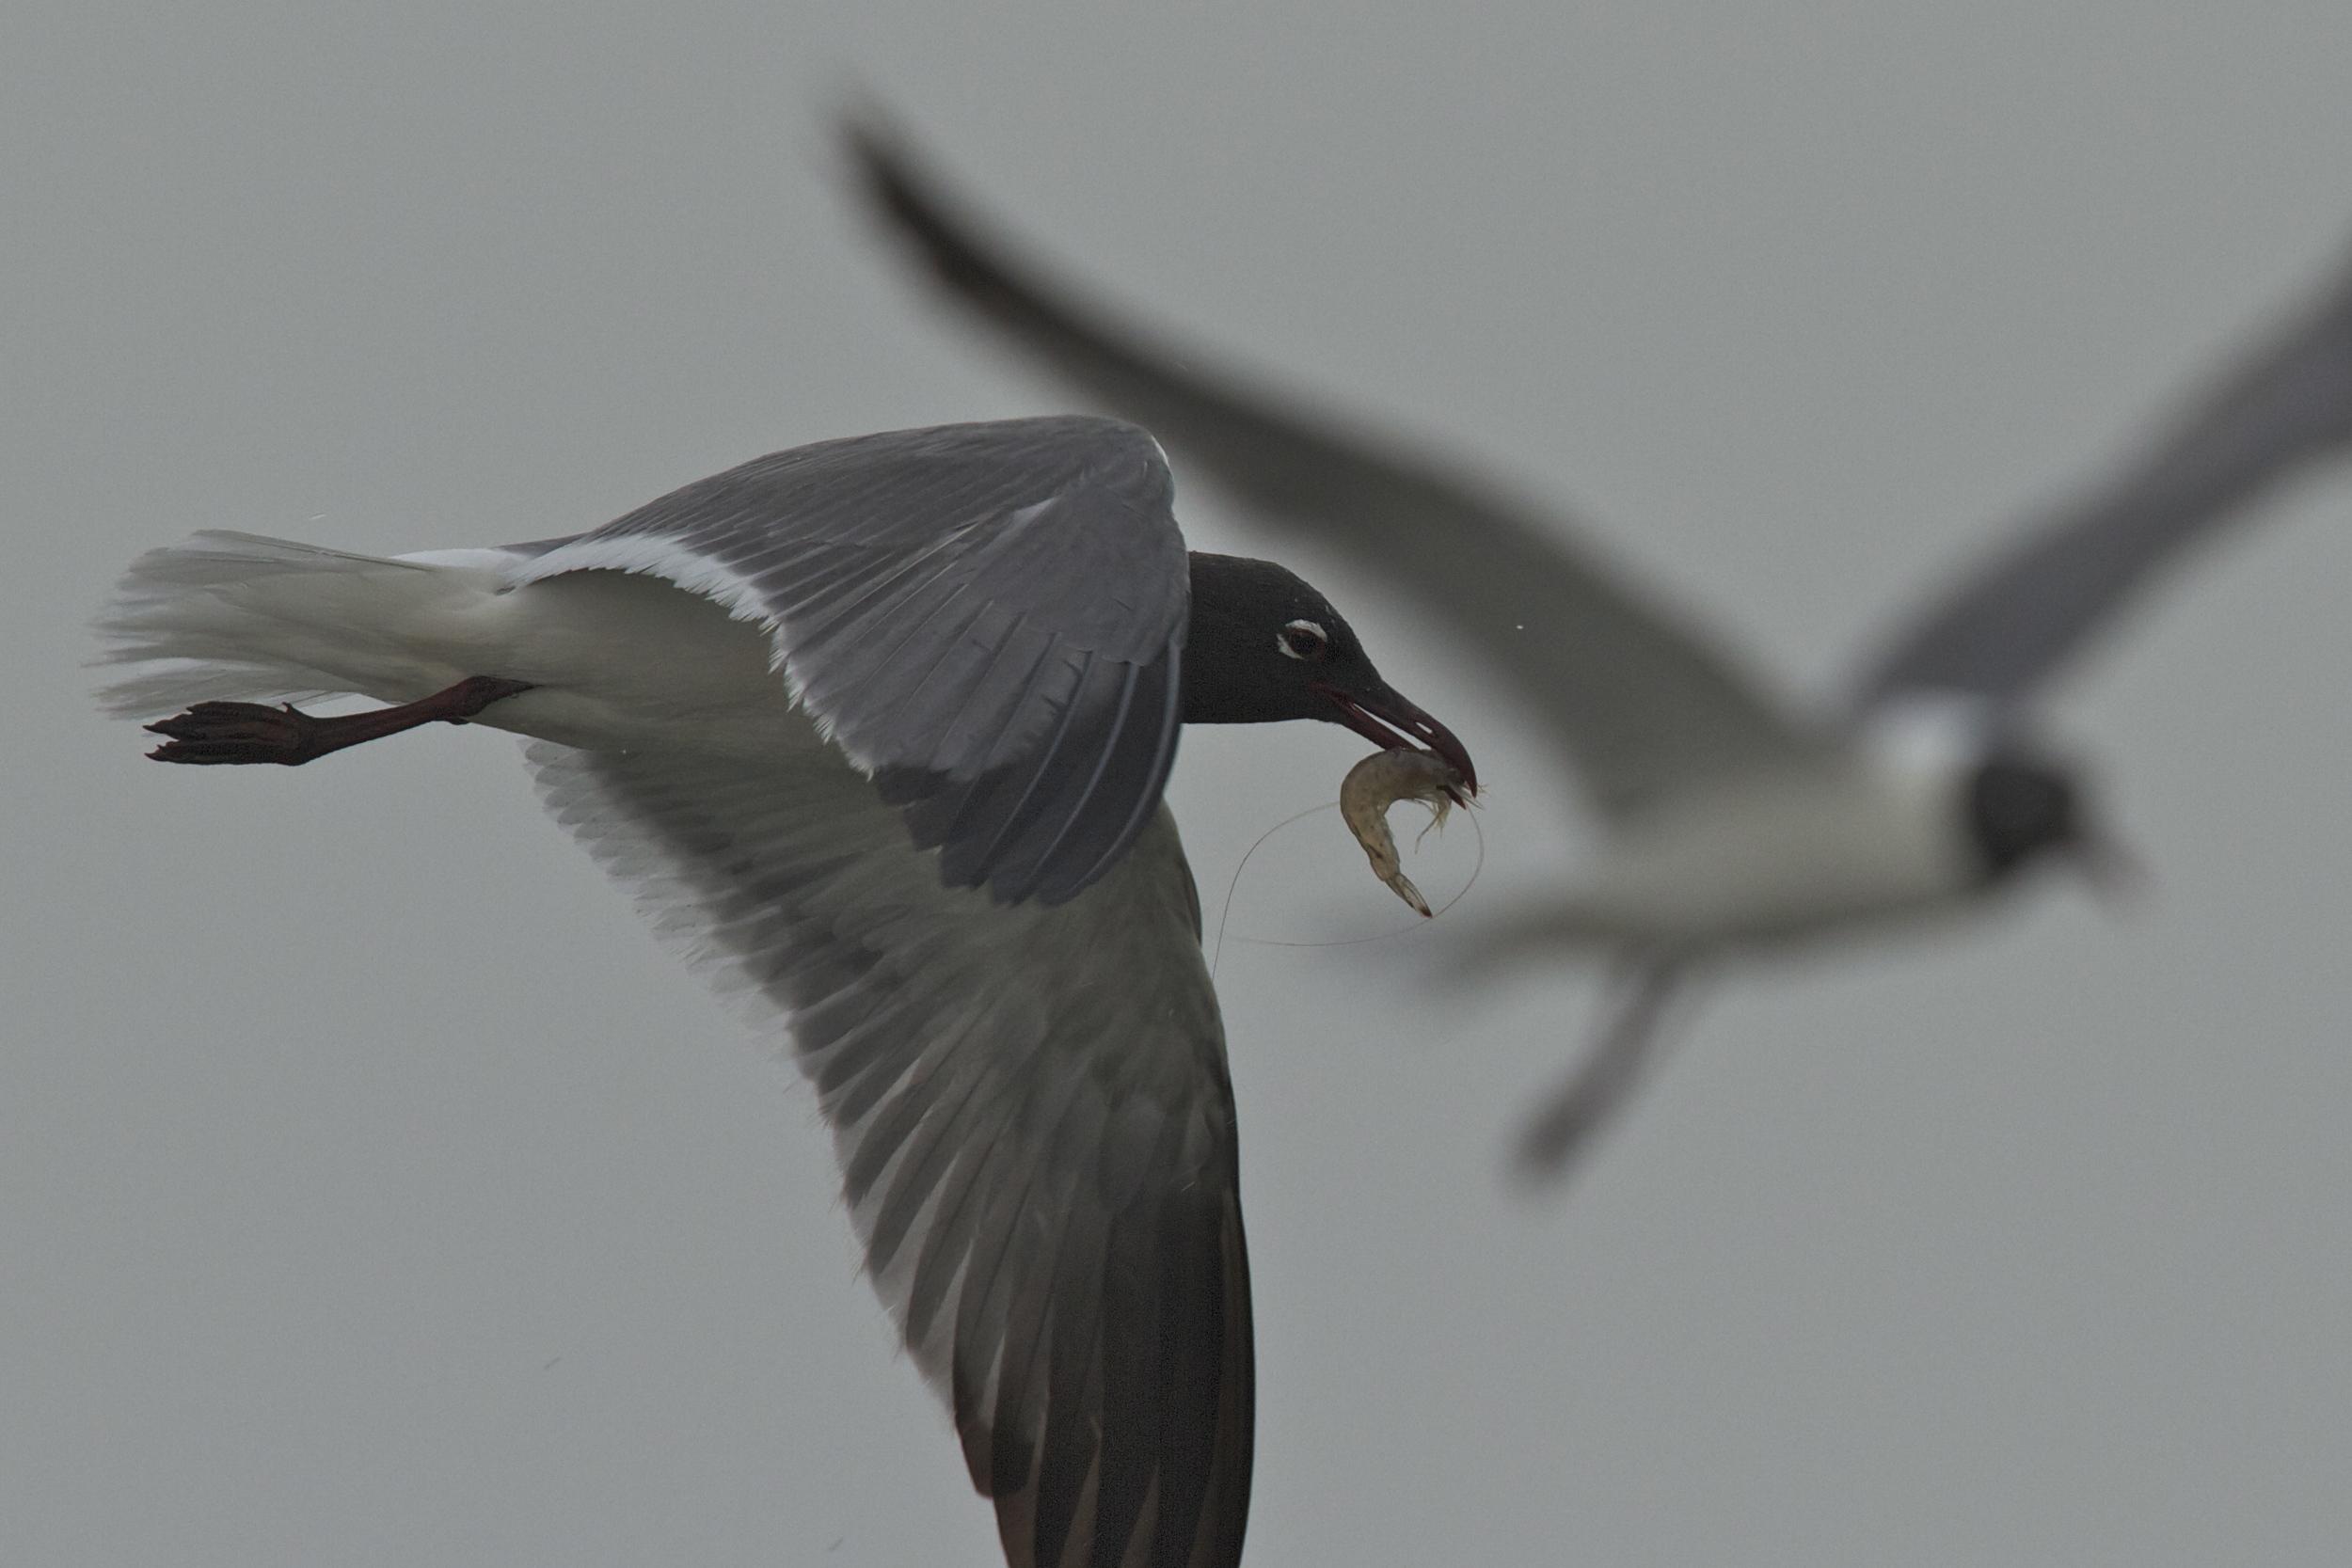 Laughing Gull, Barataria Bay, Louisiana